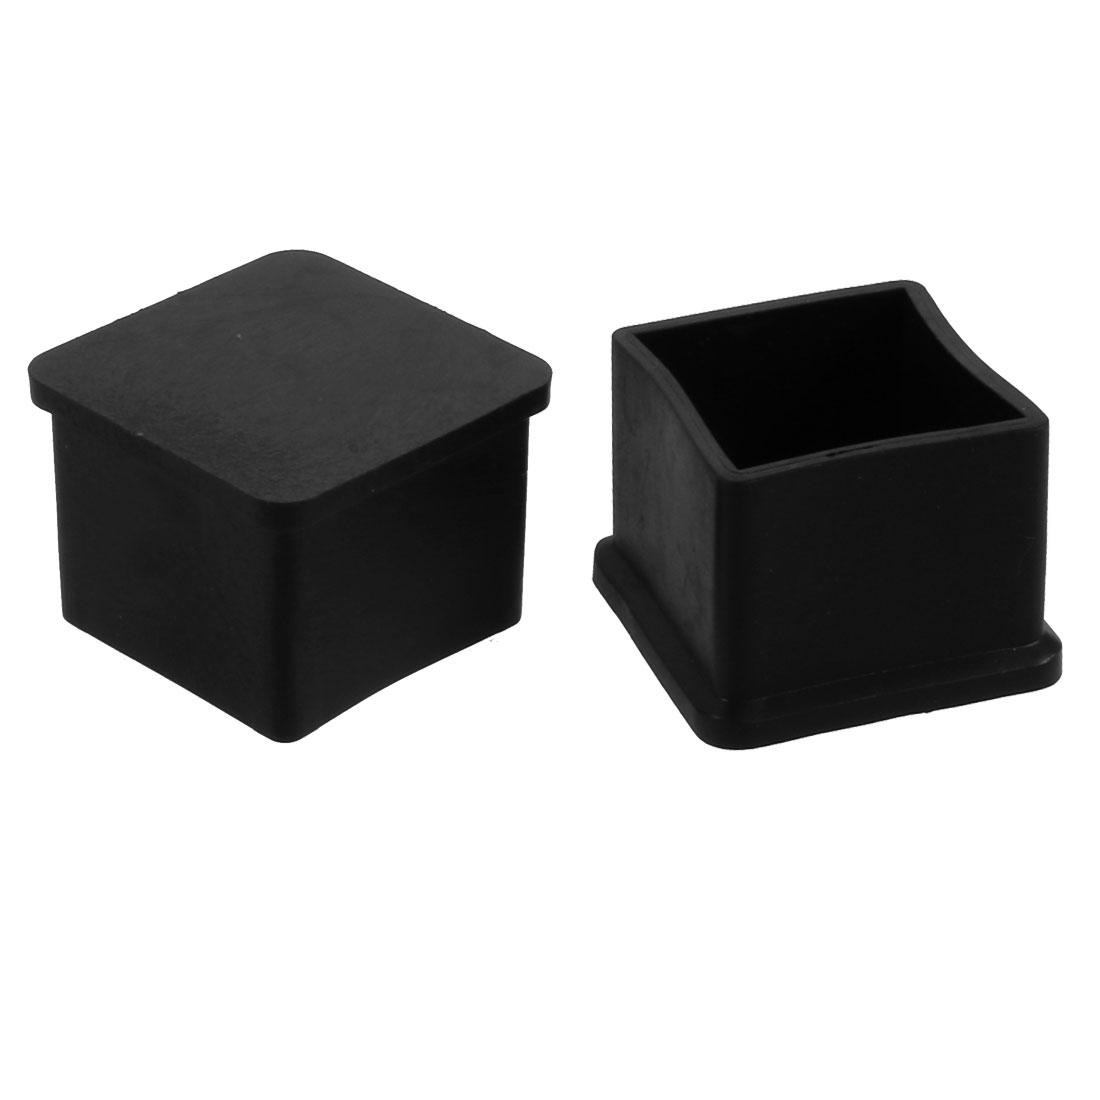 2pcs 30mm x 30mm Pipe Tube Insert Chair Leg Cap Black PVC Tubing Plug